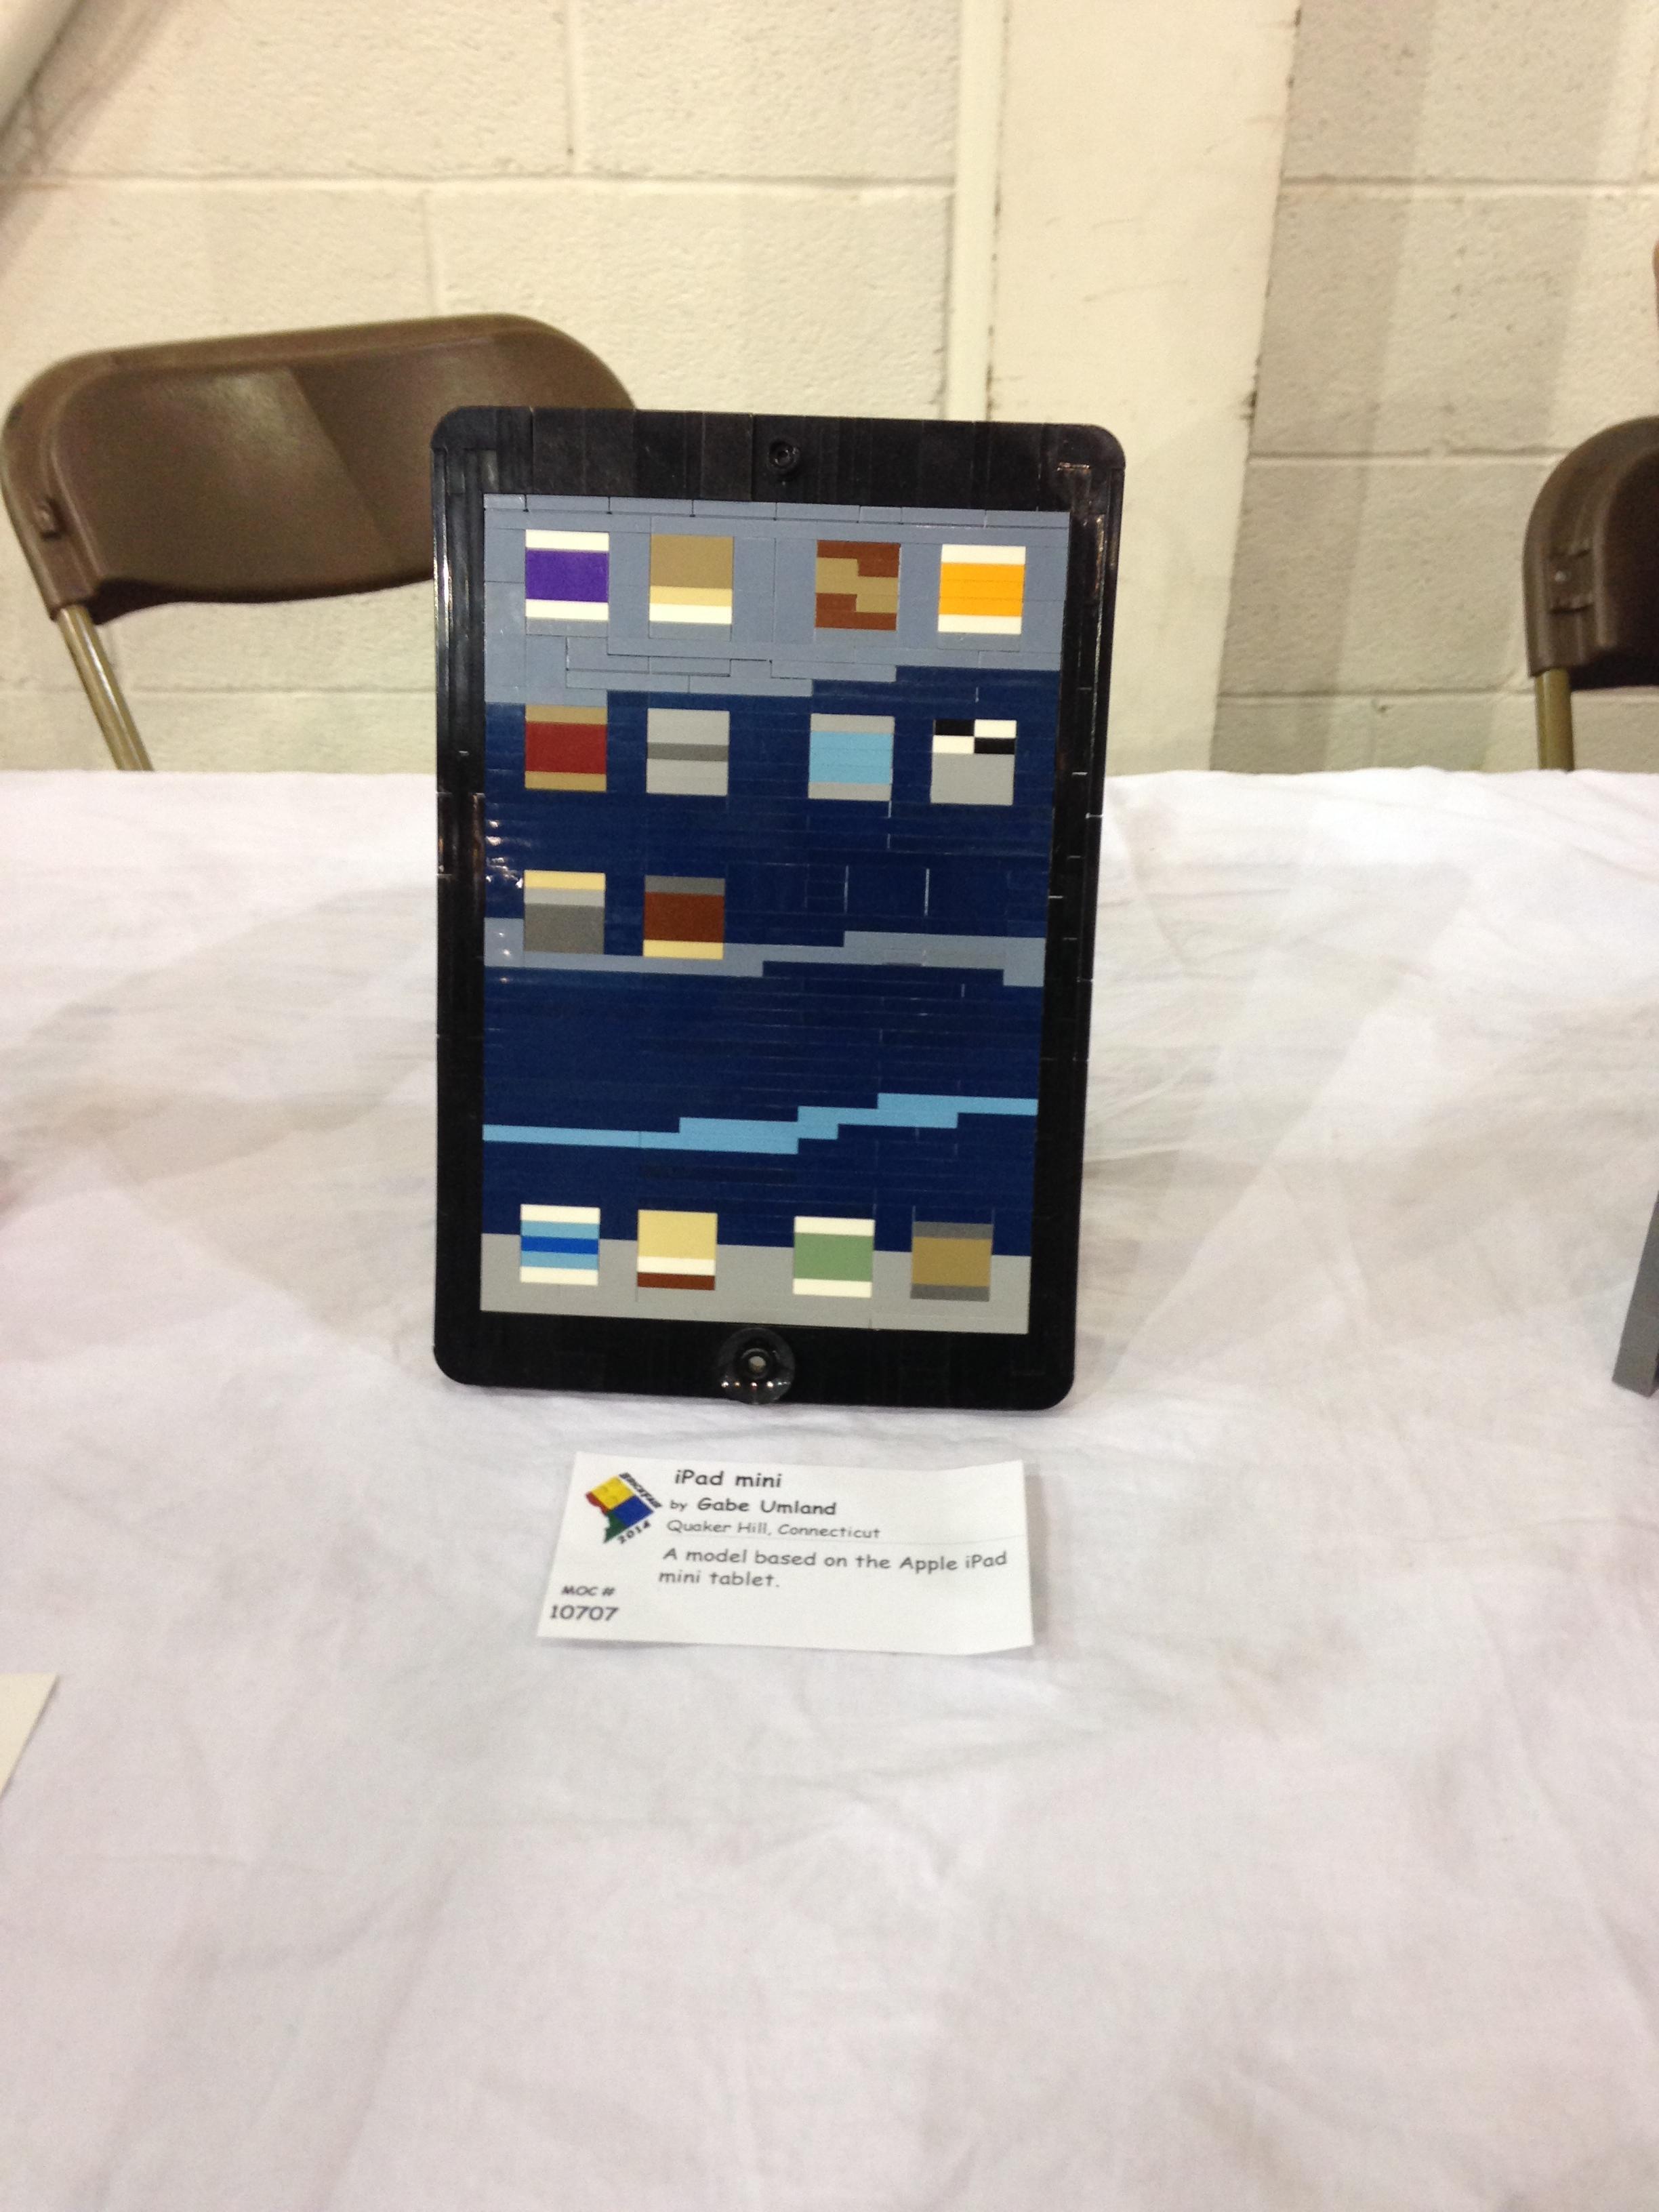 A Lego iPad